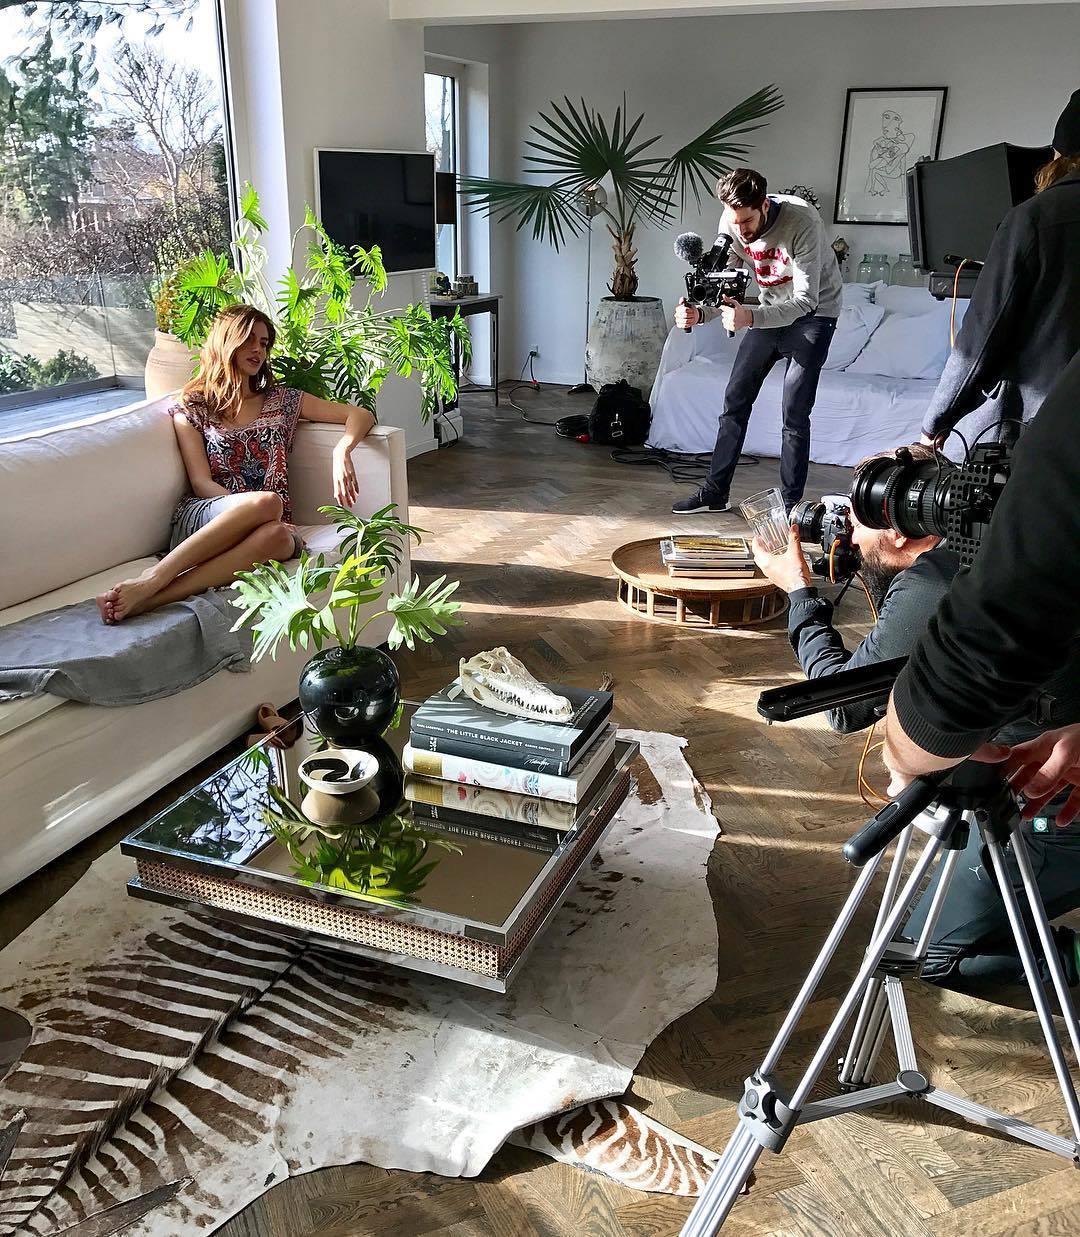 Video Rebecca Kelly nude photos 2019